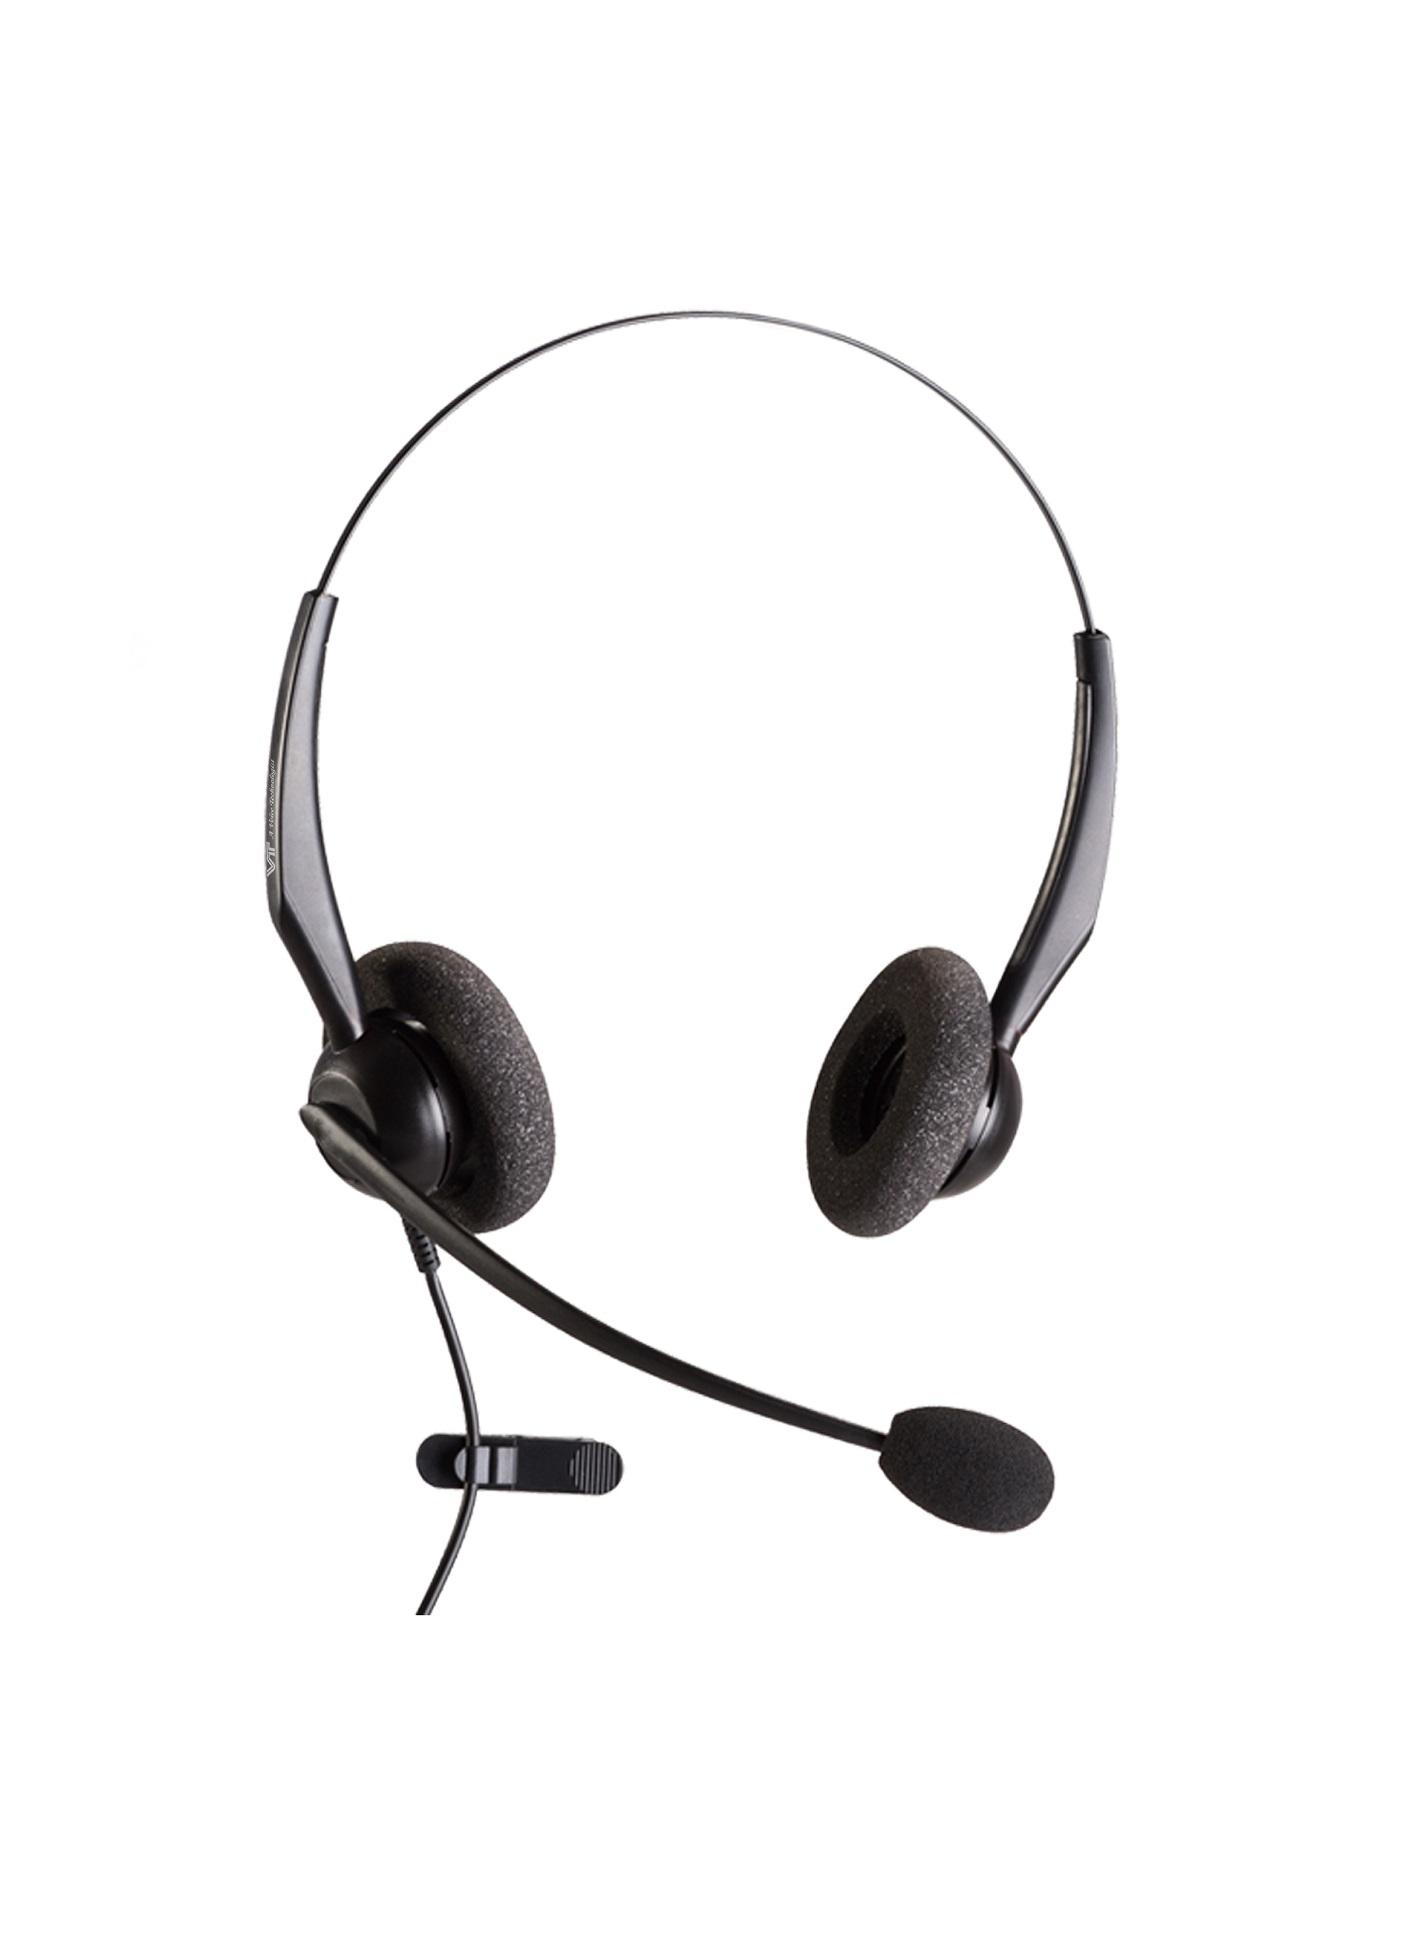 VT 2000NC-D Dual Noise Cancelling PC Headset USB